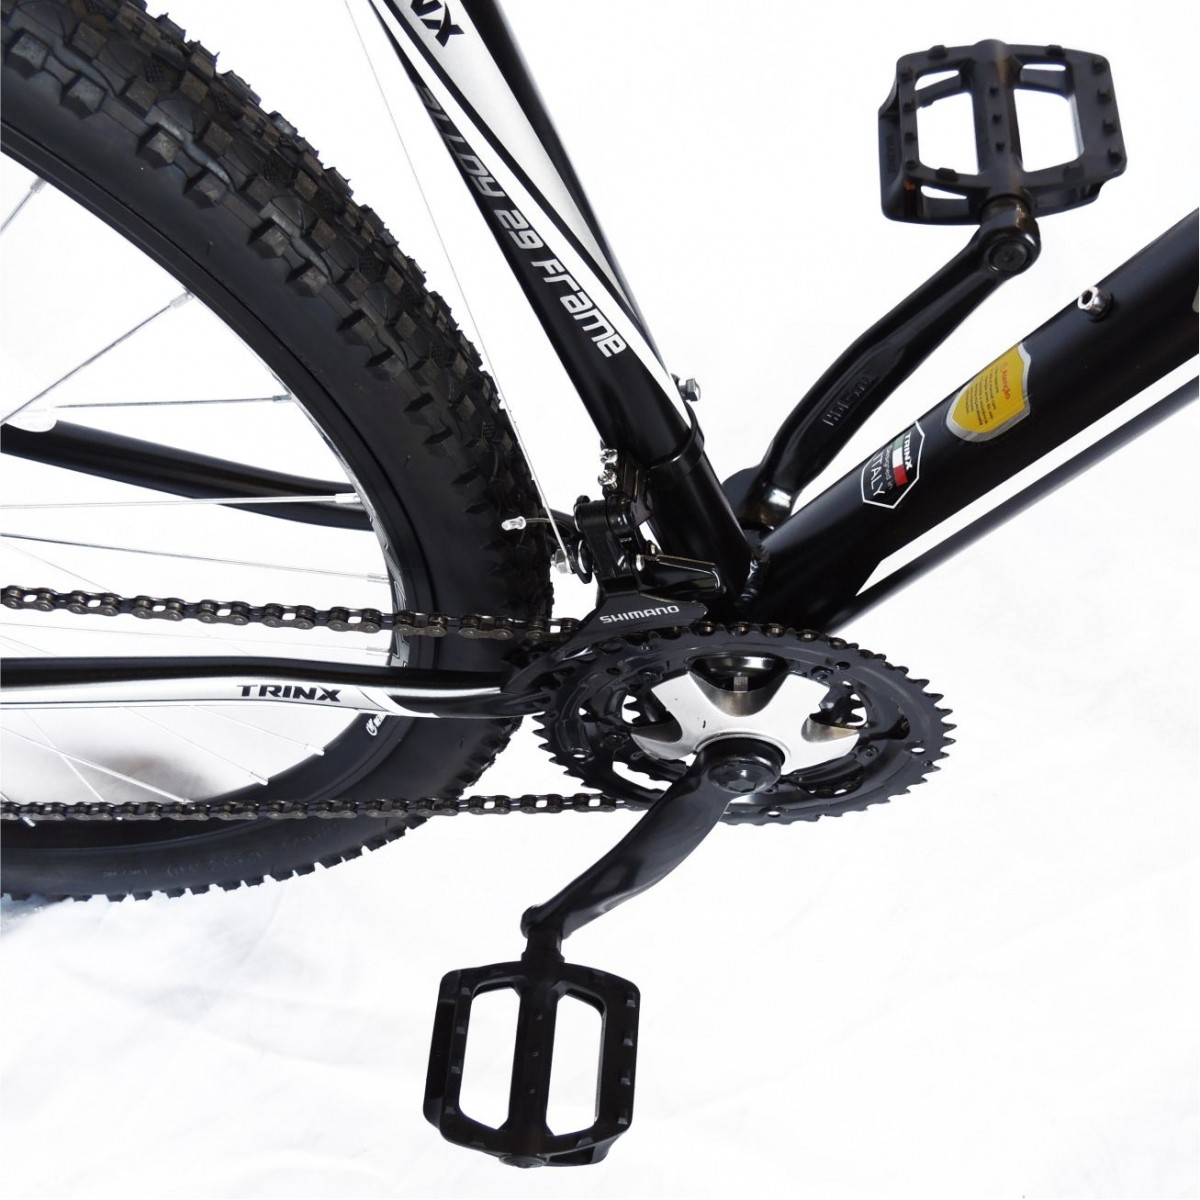 Bicicleta Trinx STI 2.0 Aro 29 Freio/DISC Susp 24V Kit Shimano Preto com Cinza